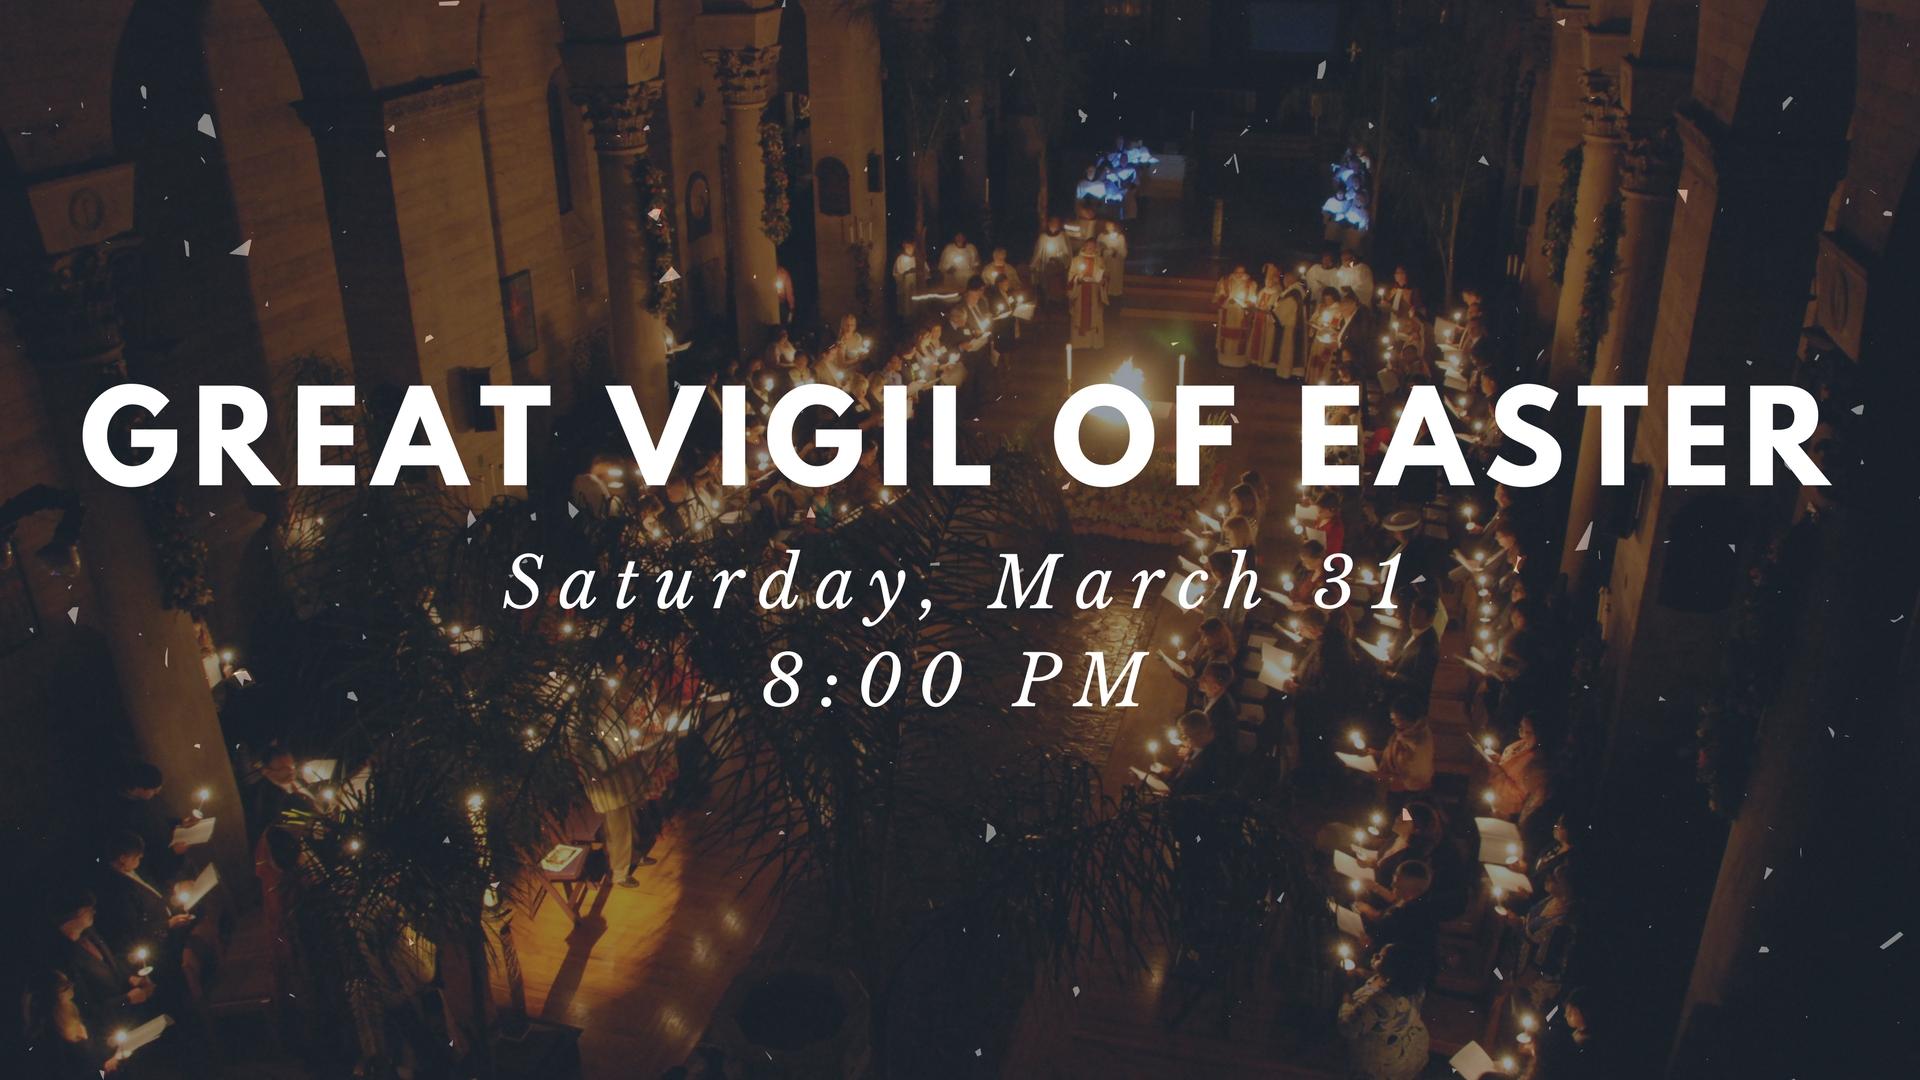 Great Vigil of Easter